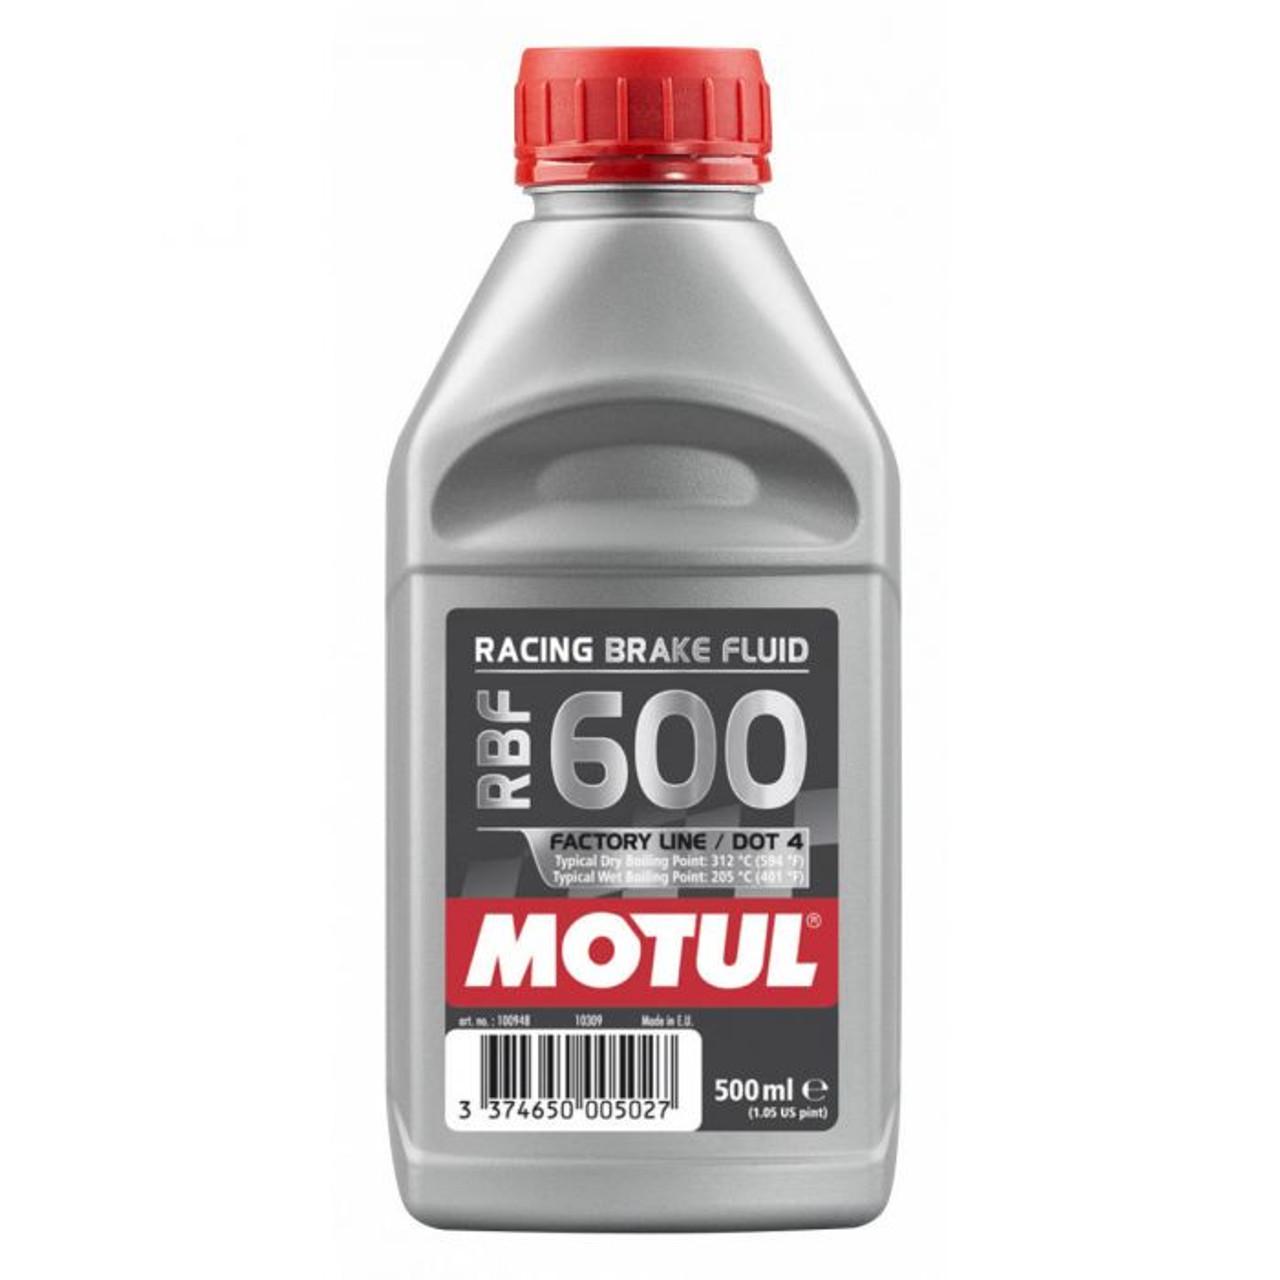 Motul RBF 600 Factory Line DOT 4 Brake Fluid